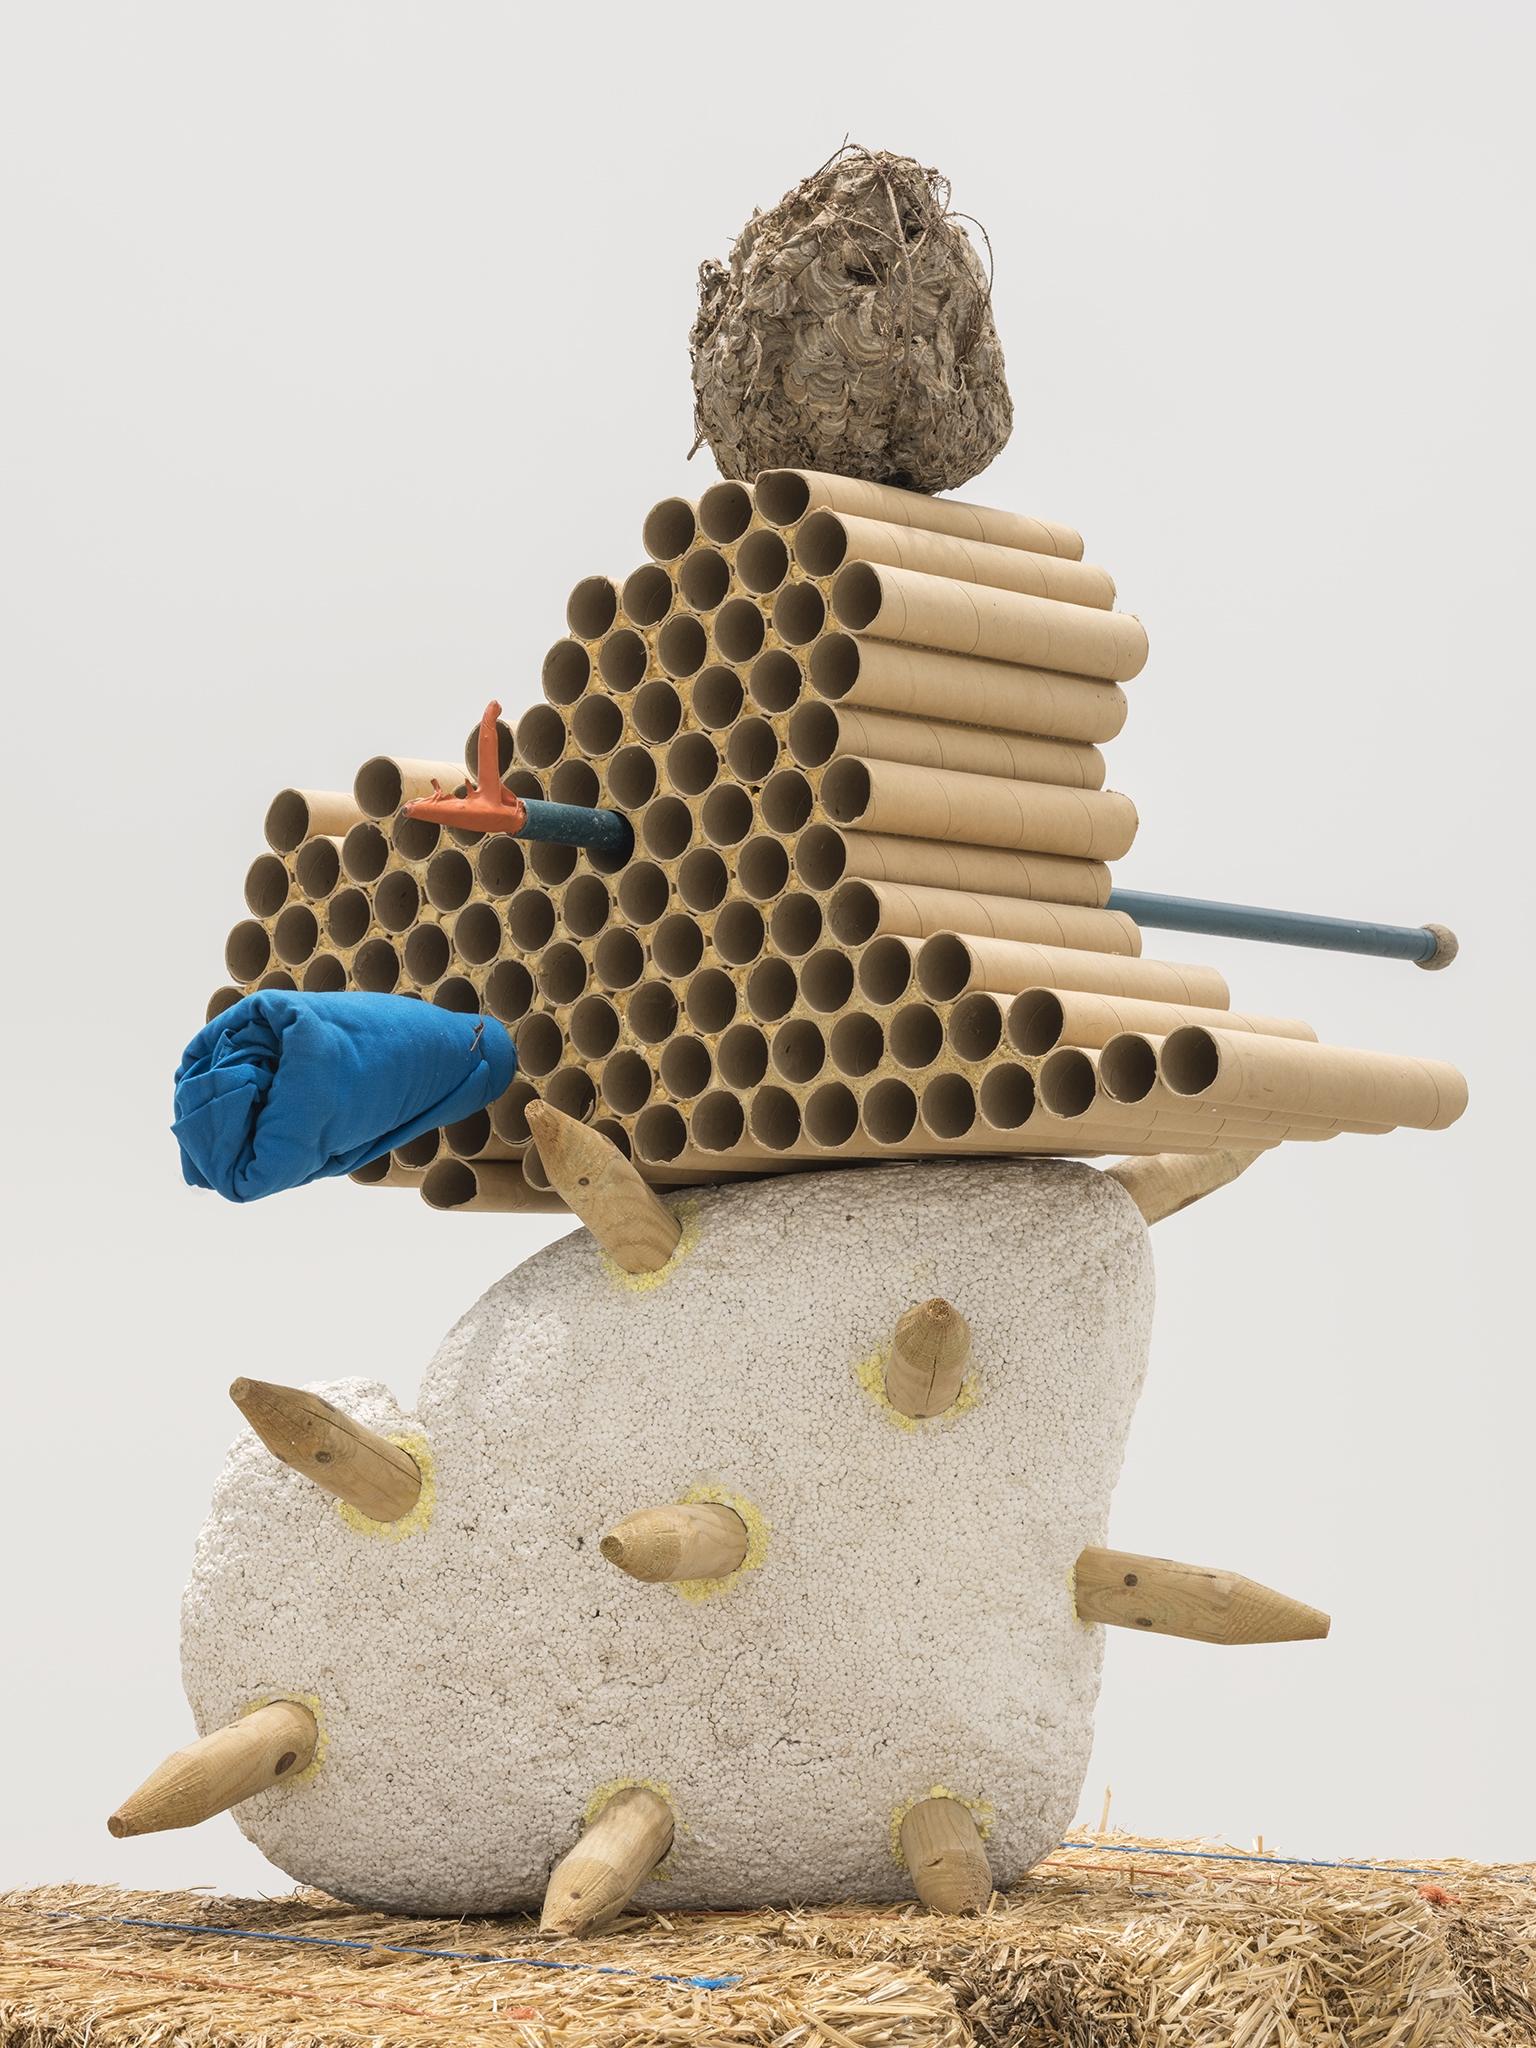 Jerry Pethick, Gobi Clone (detail), 1996/1997, straw bales, styrofoam, wood, cardboard, hornet's nest, anodized aluminum, polypropylene rope, cloth, orange rubber, iron wire, sulphur, dried fir needles, 107 x 55 x 46 in. (272 x 140 x 117 cm) by